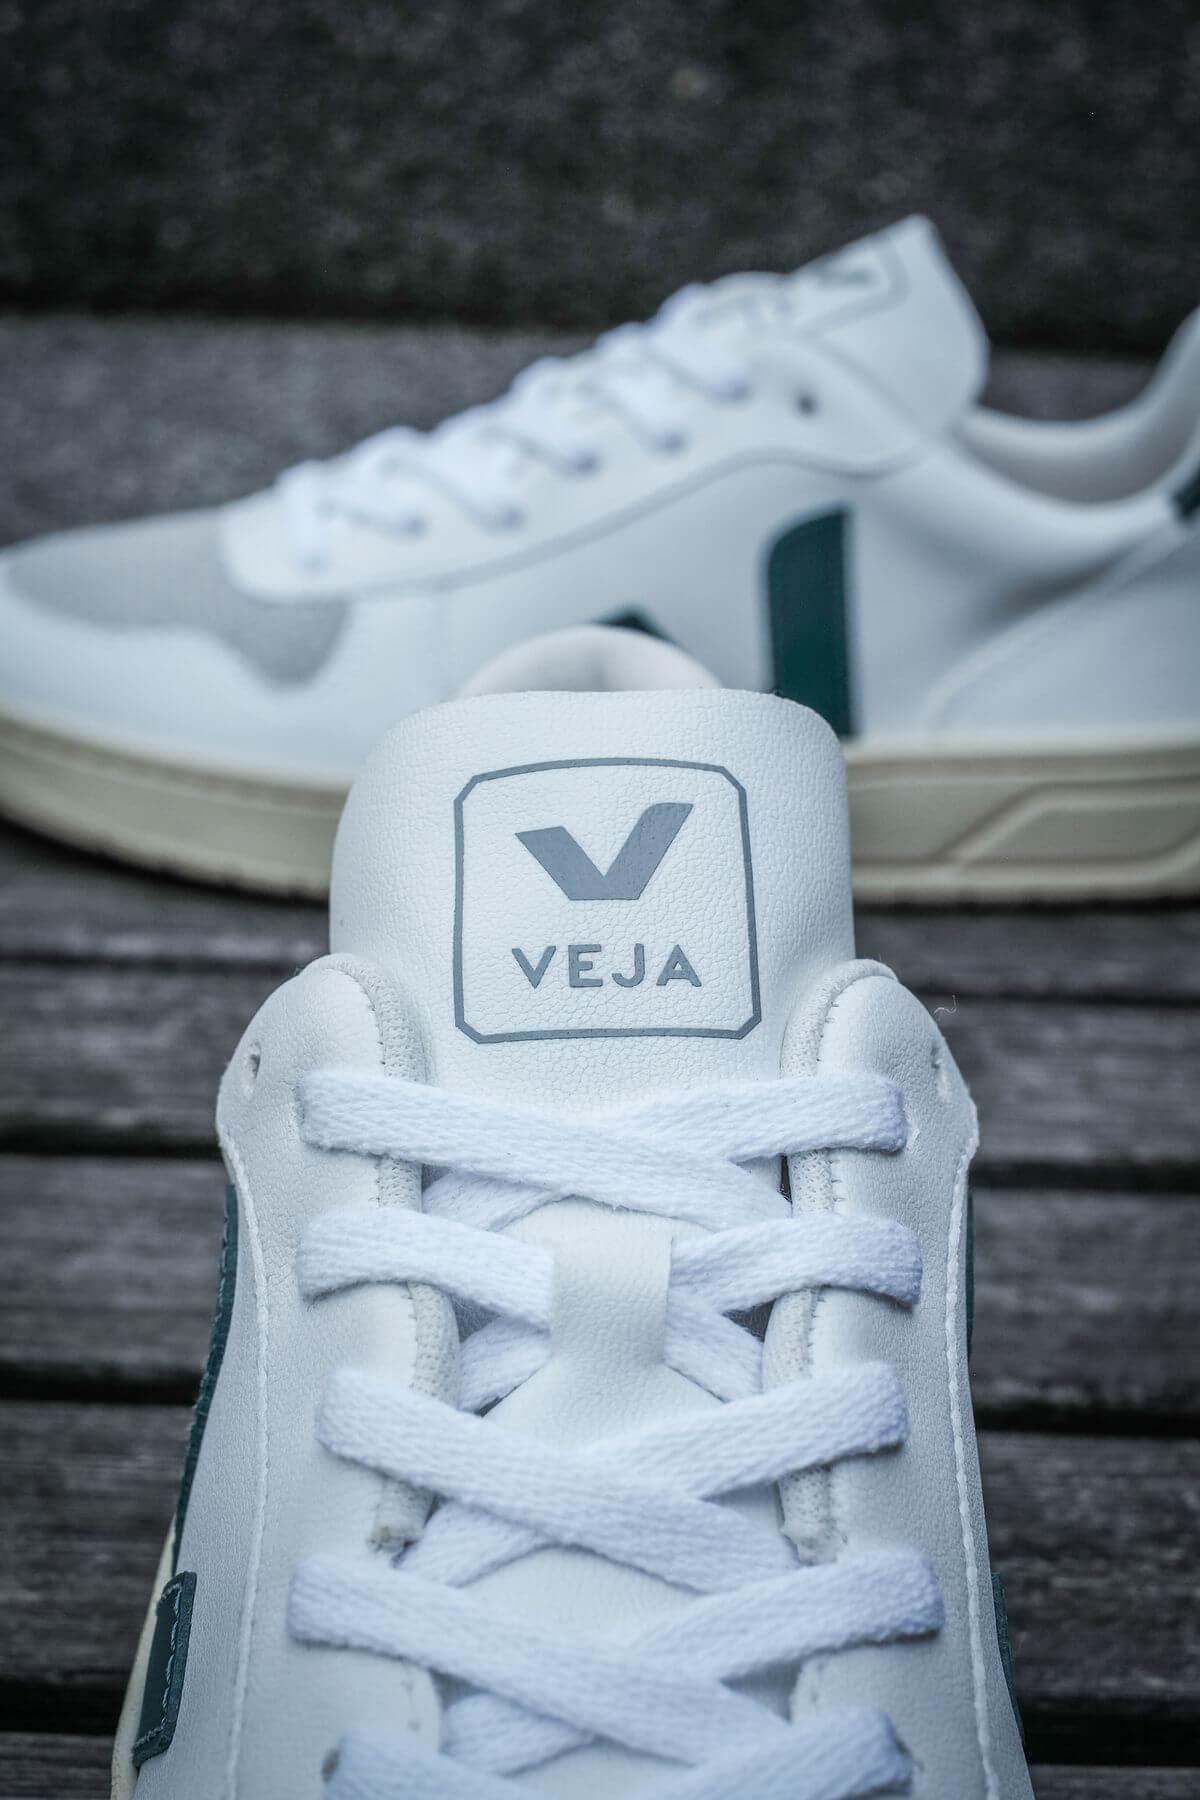 VEJA - V-10 CWL - white/brittany - butter sole - VX072733B